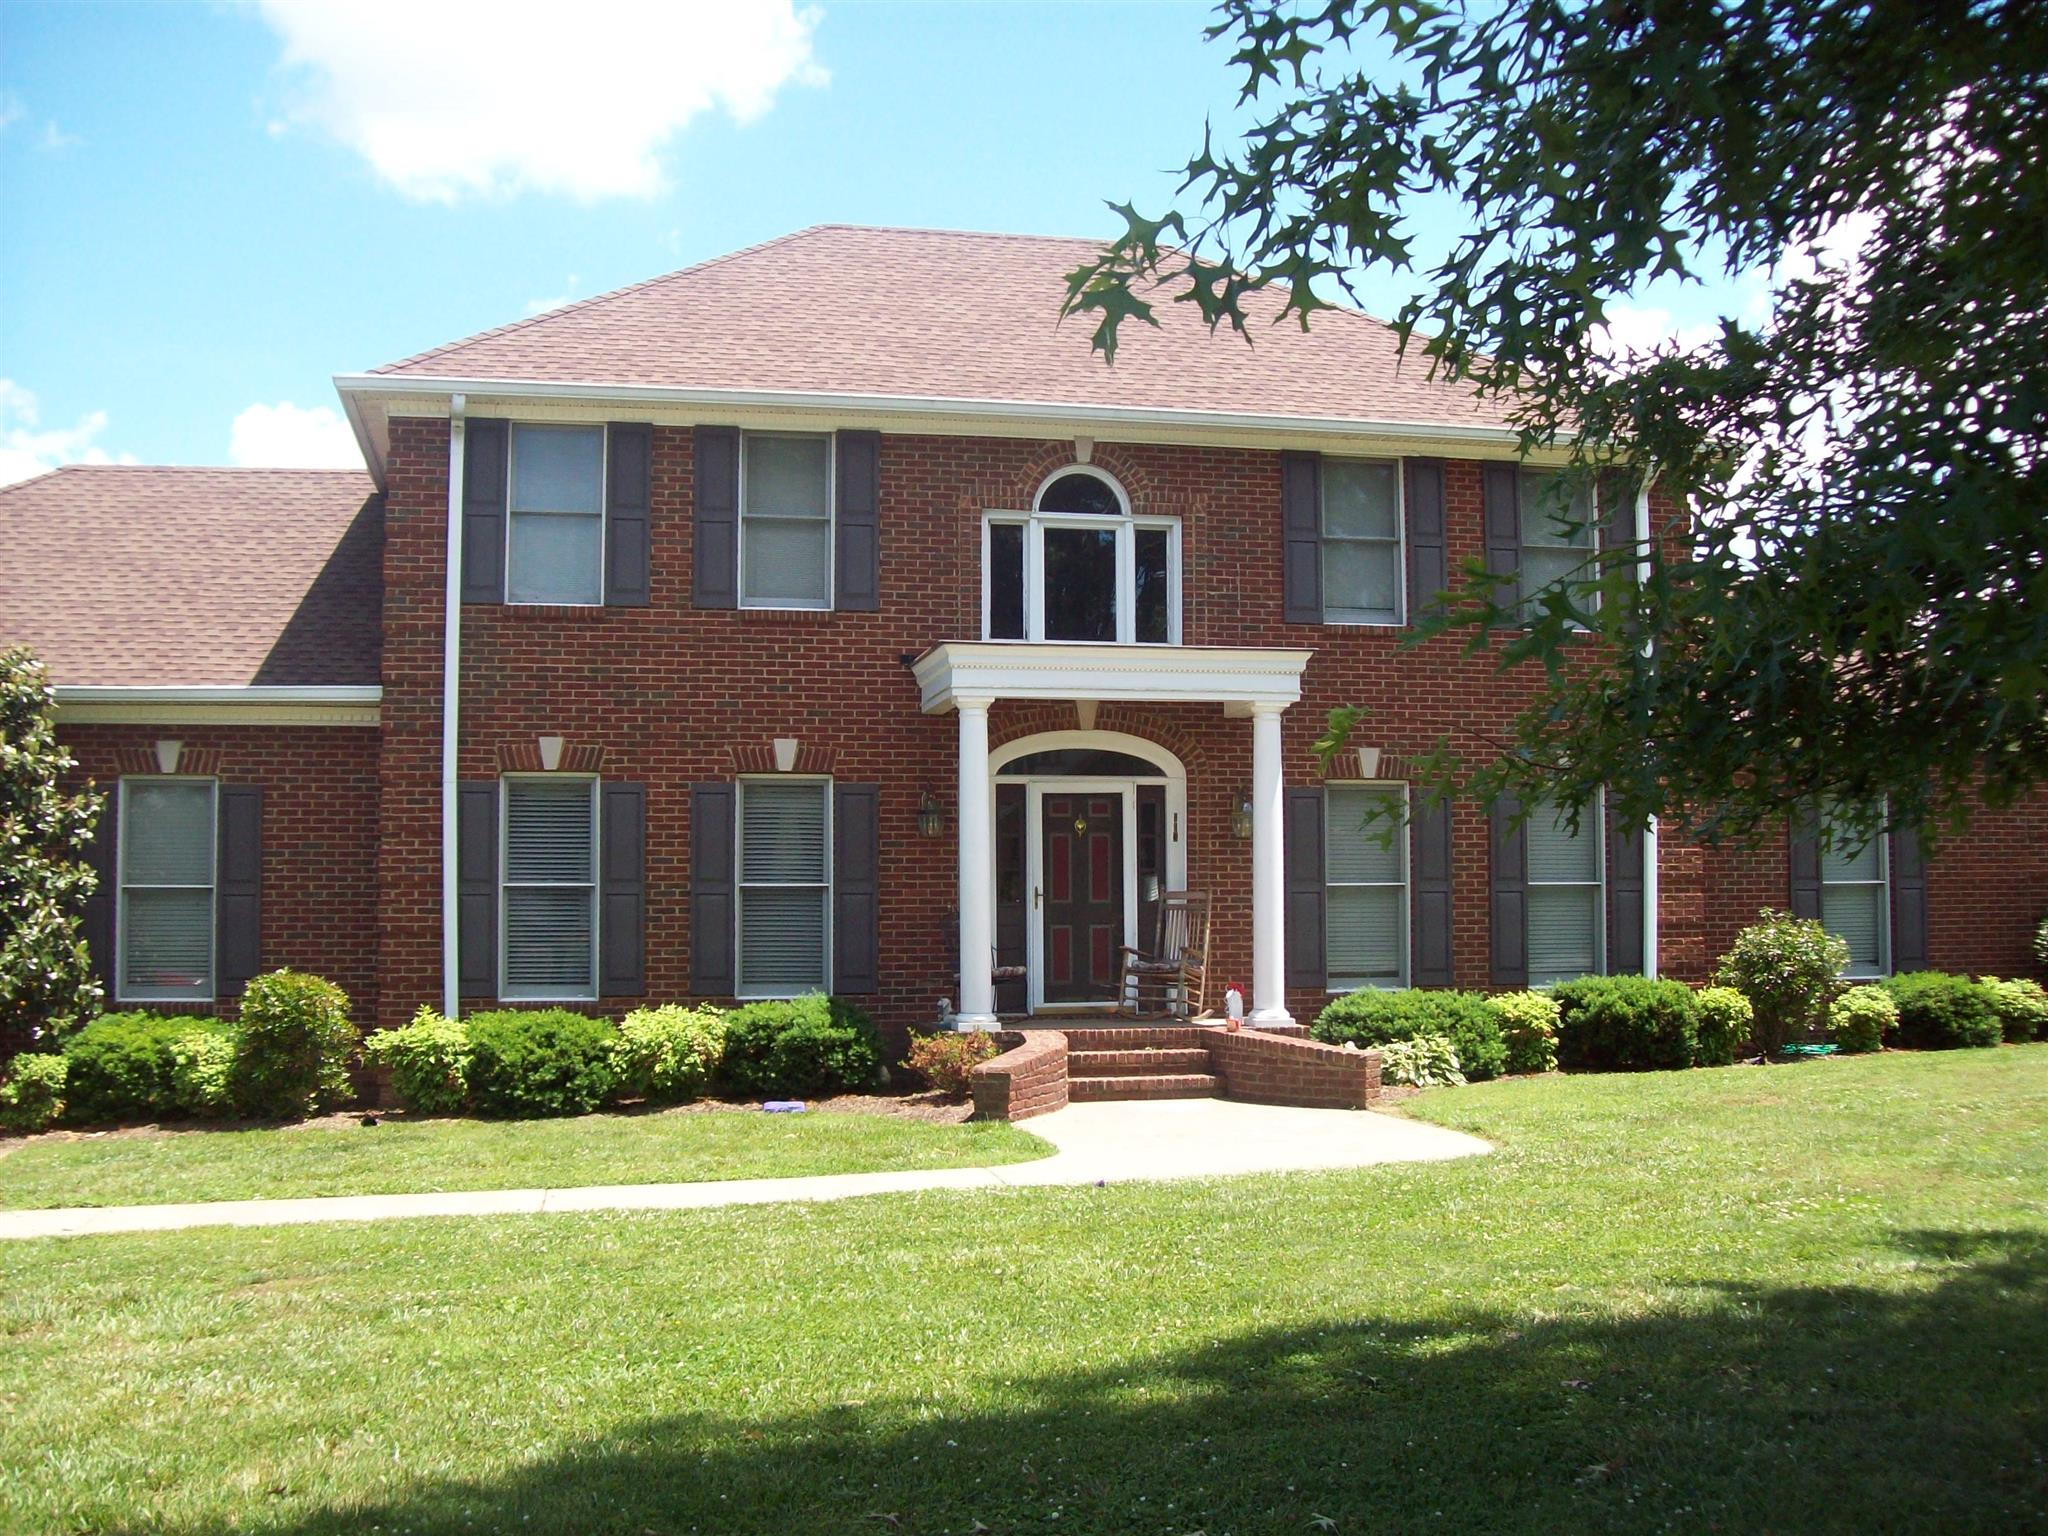 113 Peggy Ln Shelbyville, TN 37160